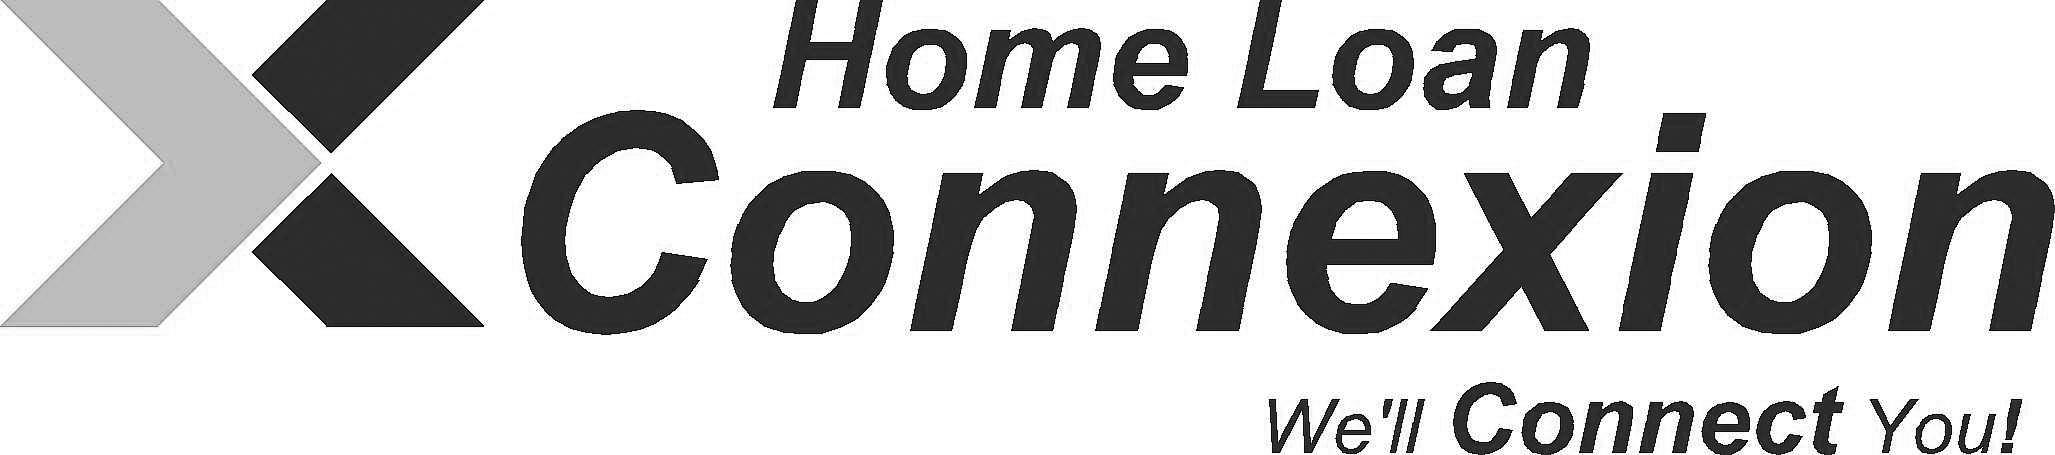 HLC logo huge (2).jpg